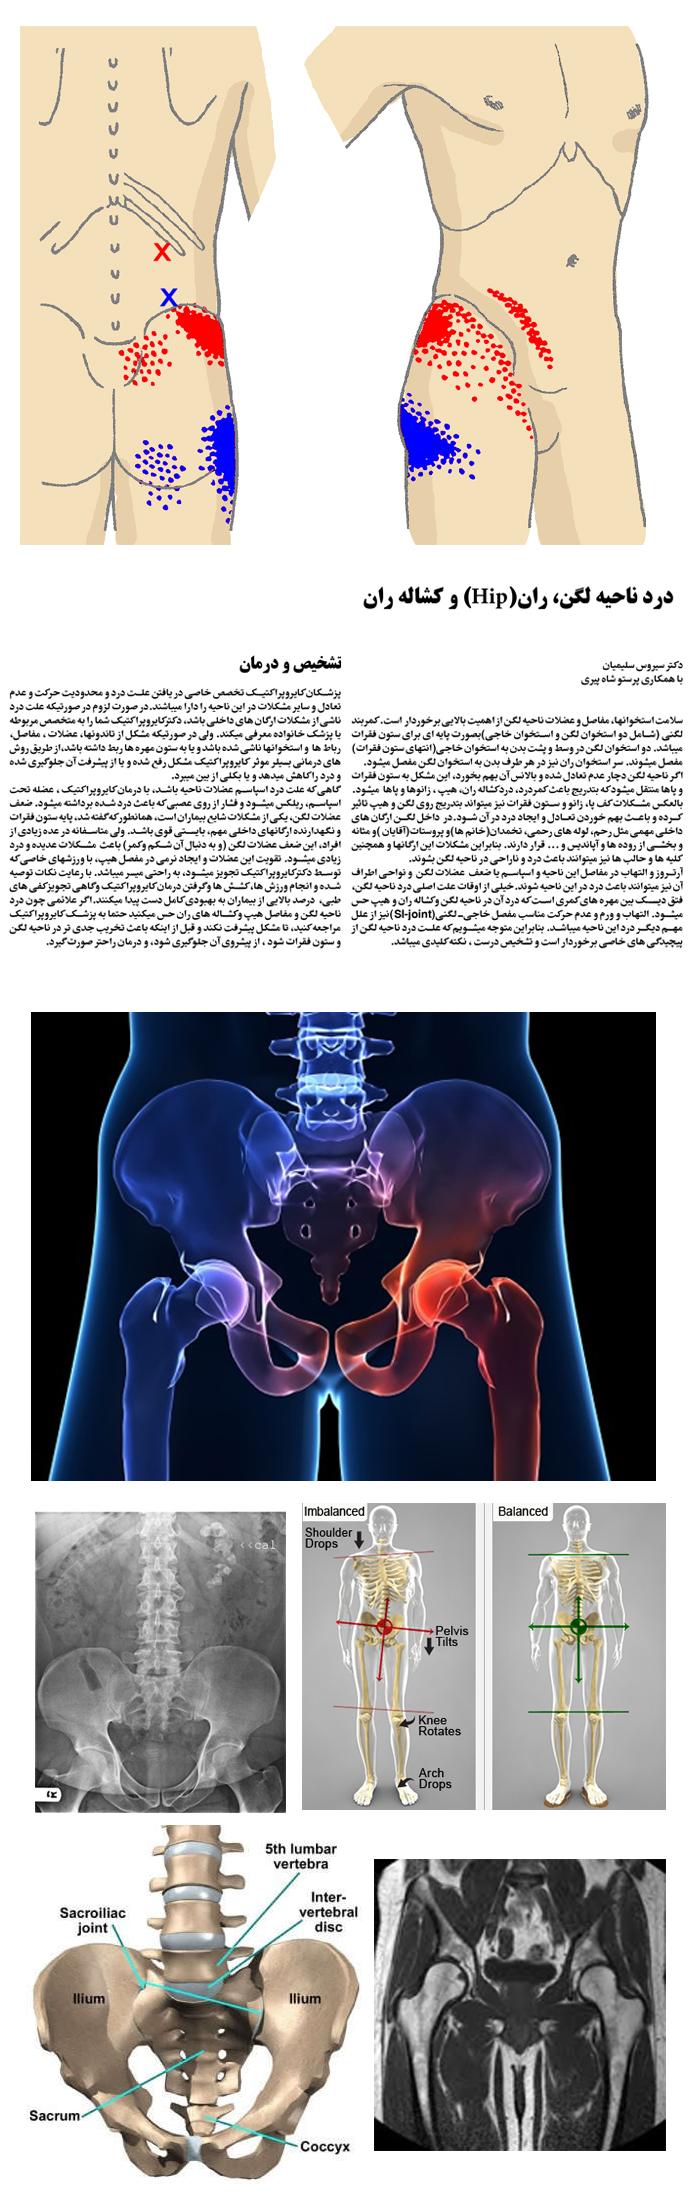 pelvic-hip